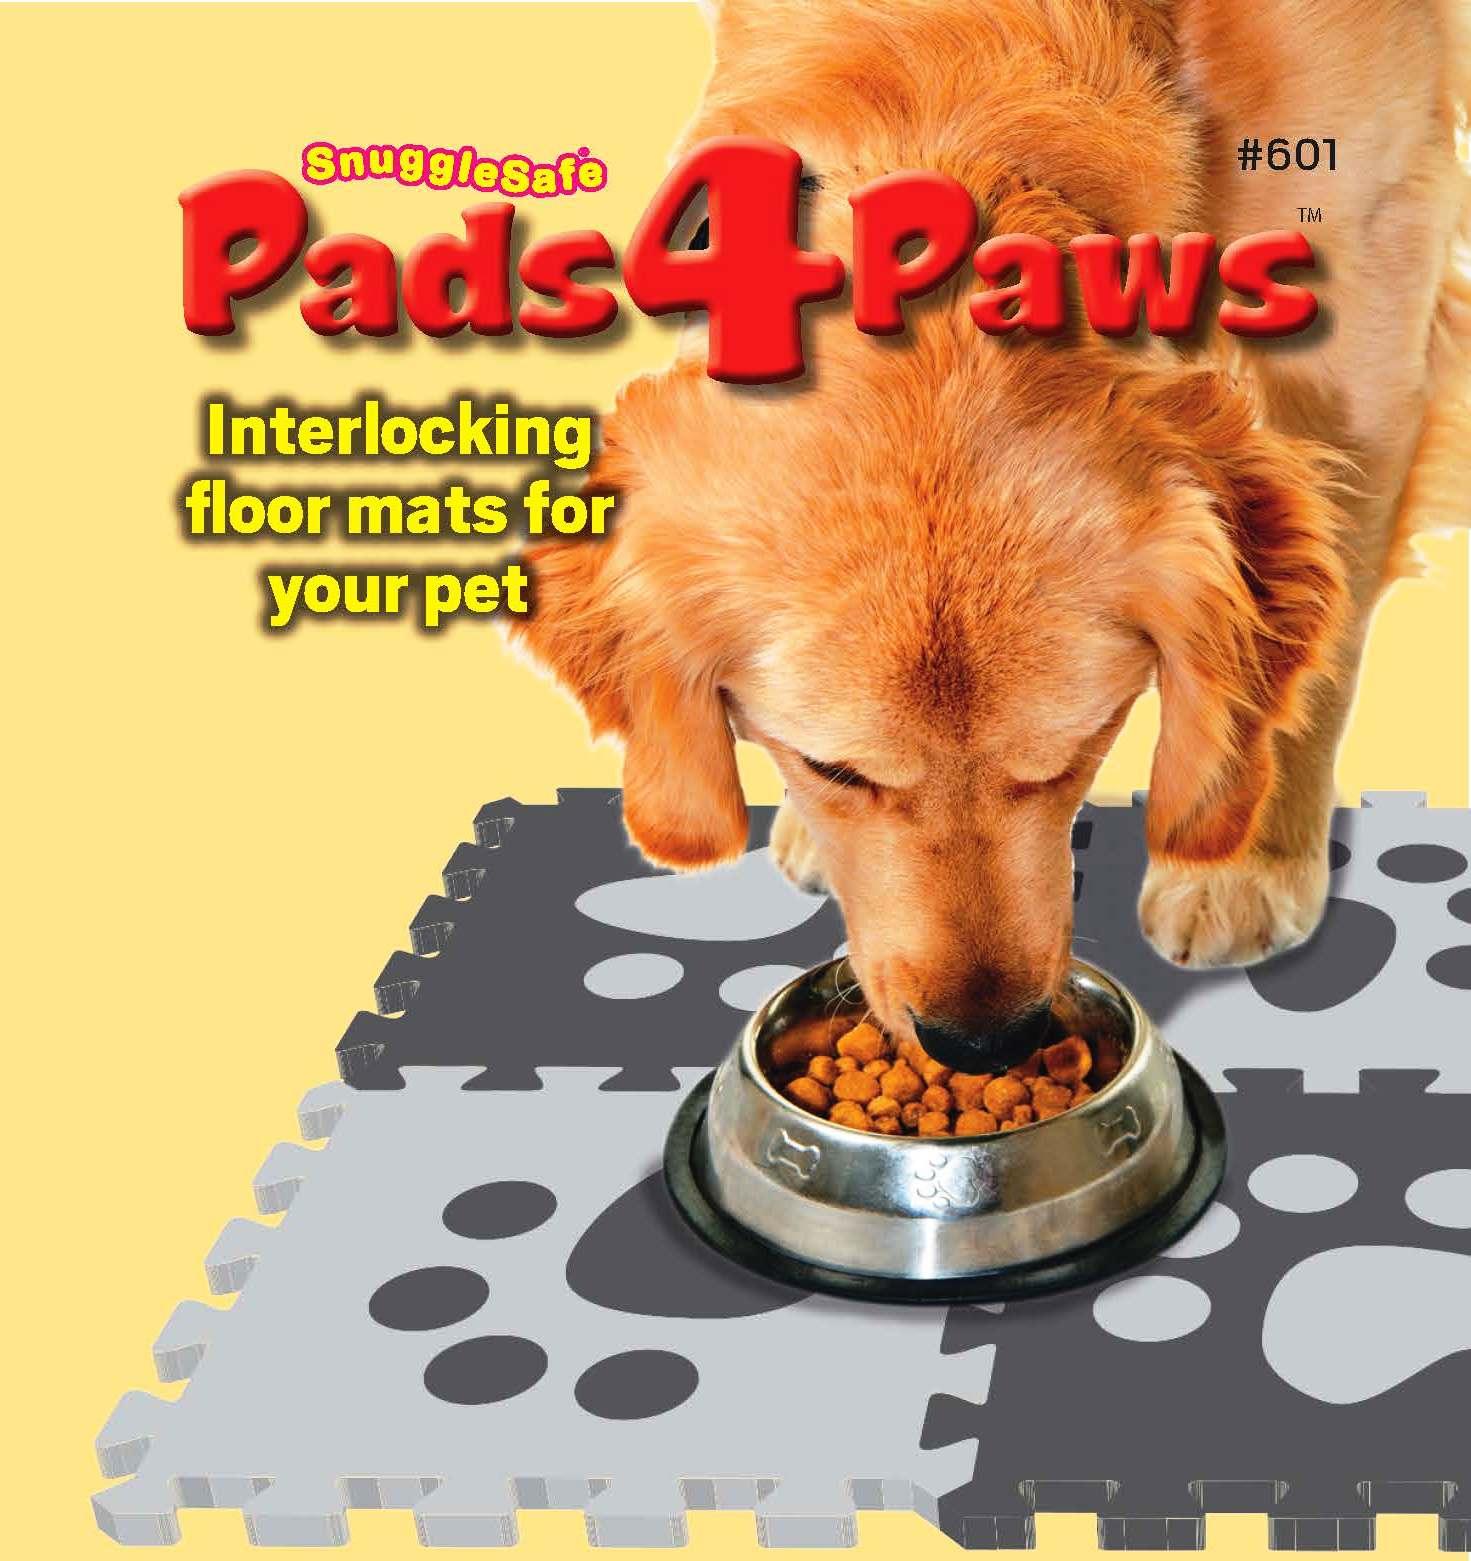 com dog mat pvc puppy shape food walmart pet placemat feeding ip floor wipe floors bowl cat clean dish paw